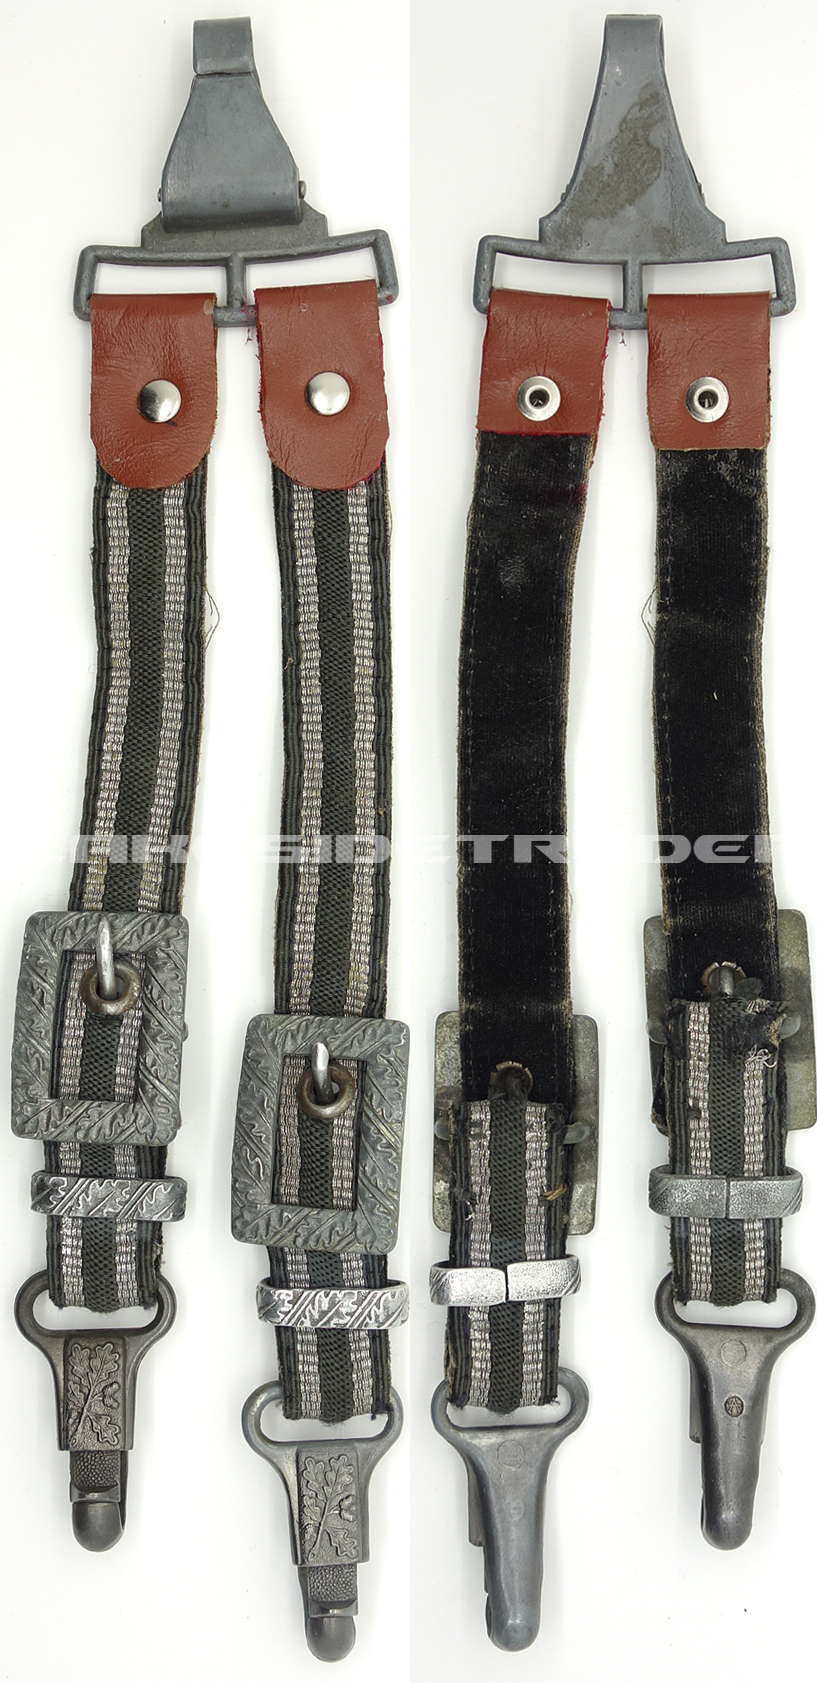 Restored Luftwaffe Hangers